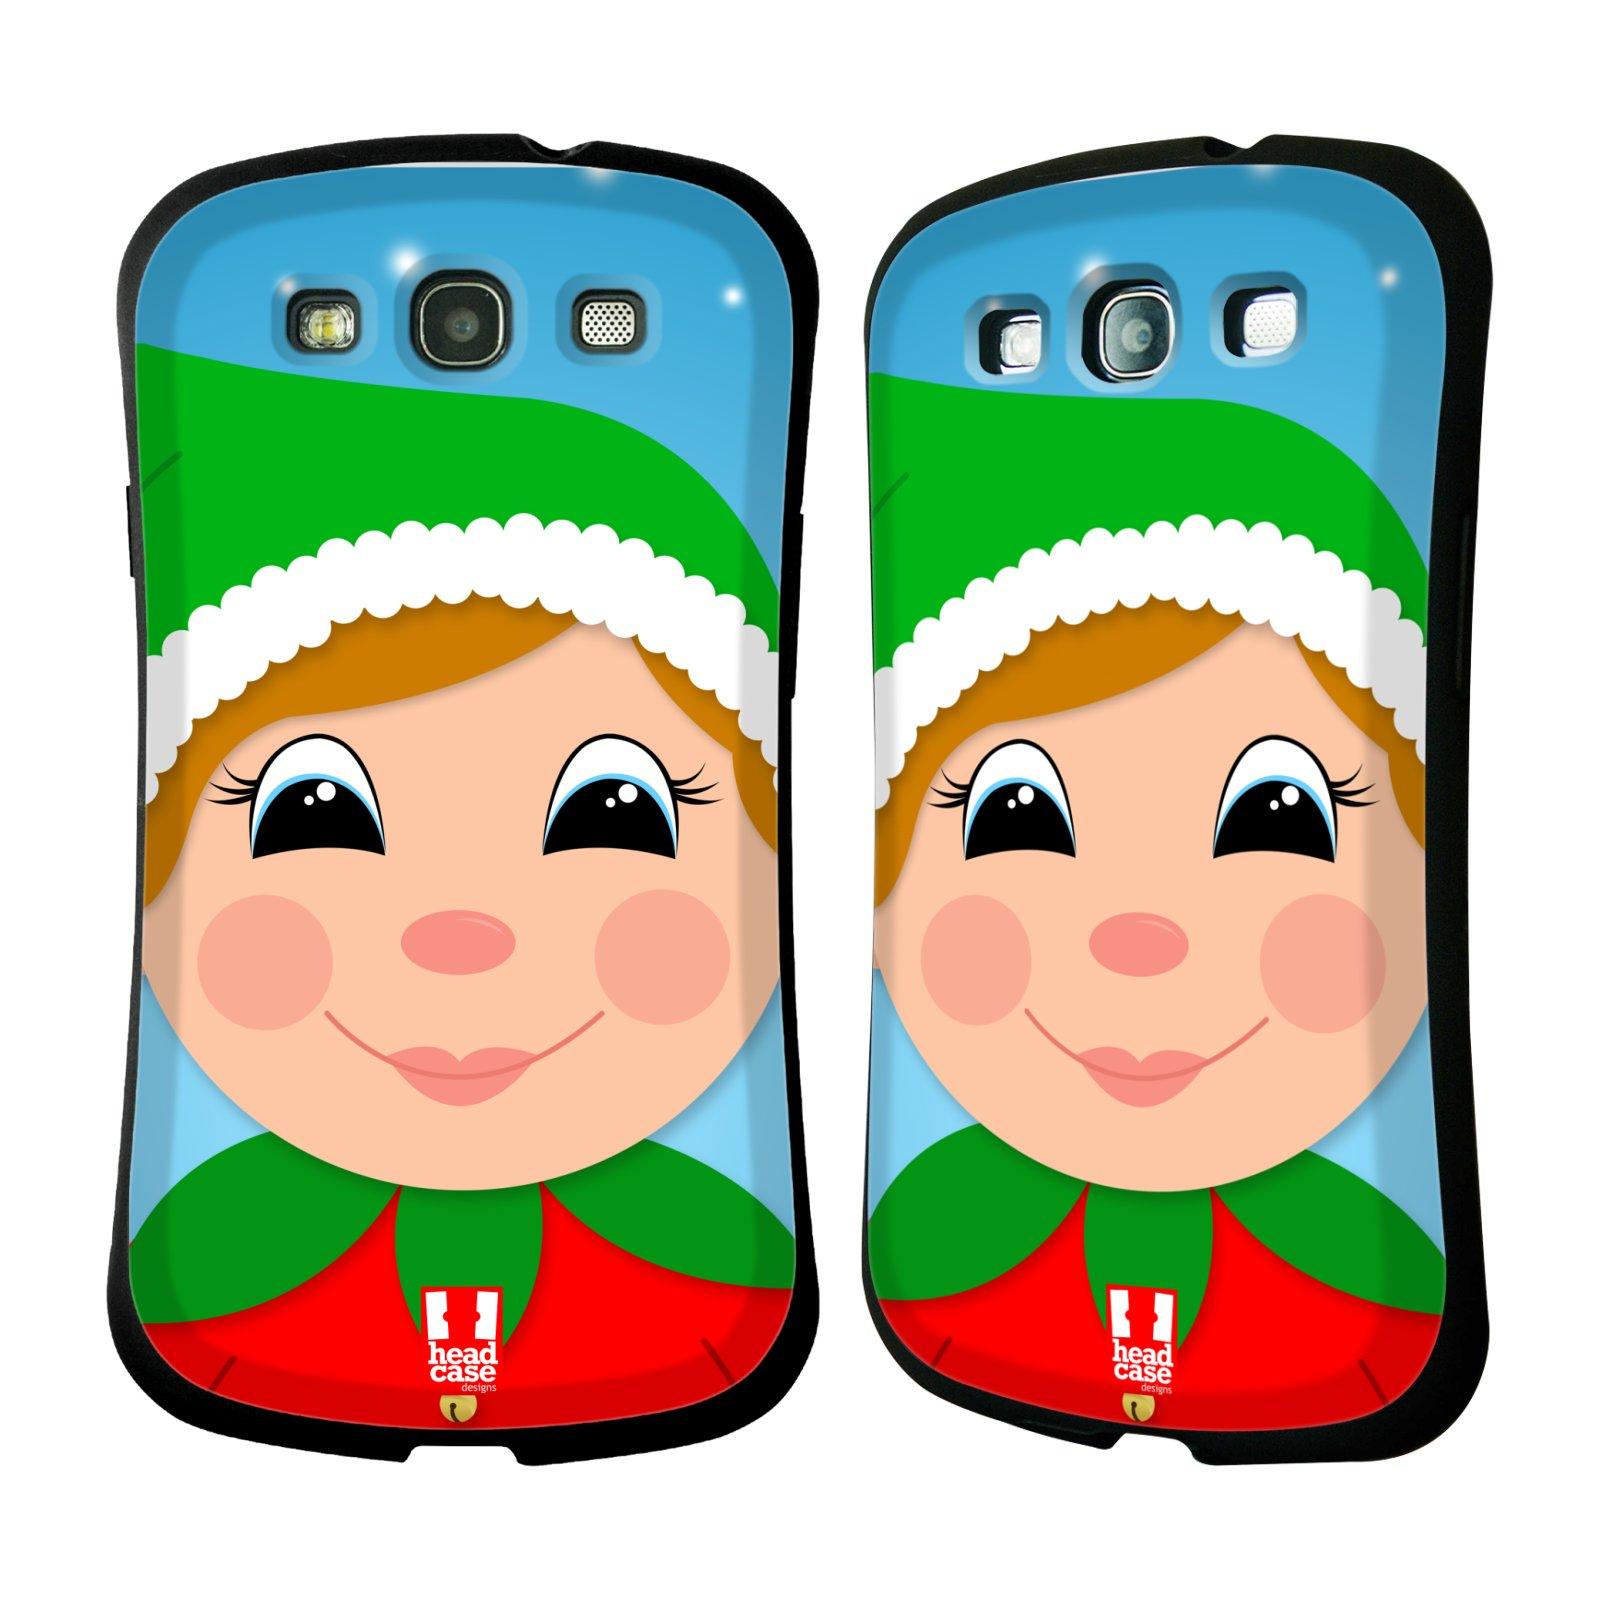 HEAD CASE silikon/plast odolný obal na mobil Samsung Galaxy S3 vzor Vánoční tváře kreslené ELF